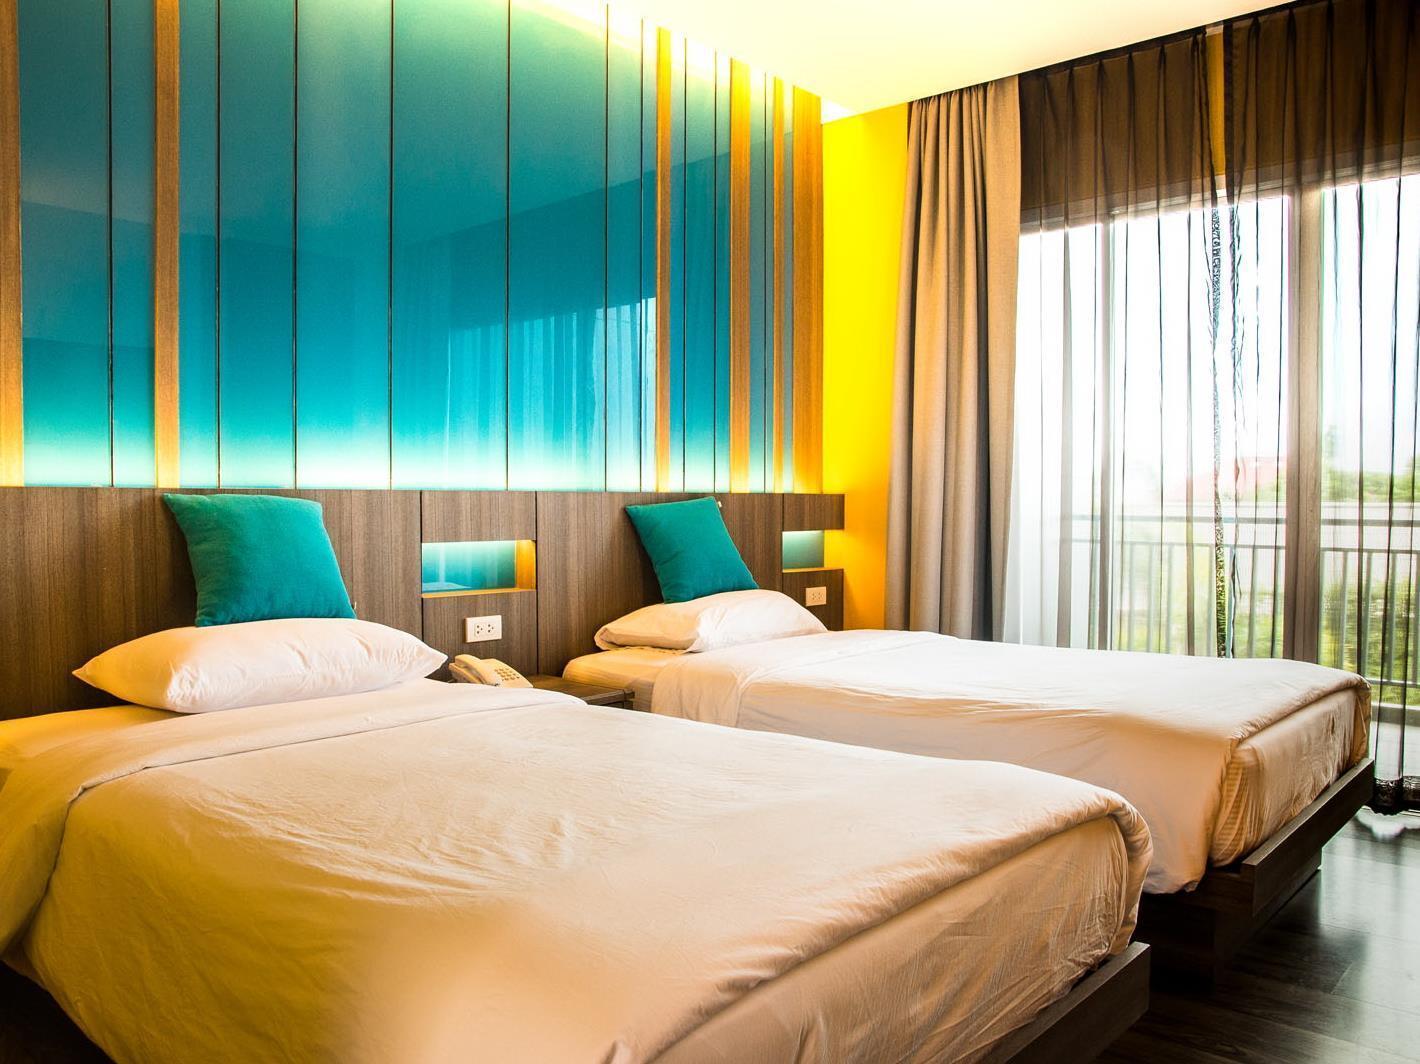 Lantana Pattaya Hotel & Resort, Pattaya